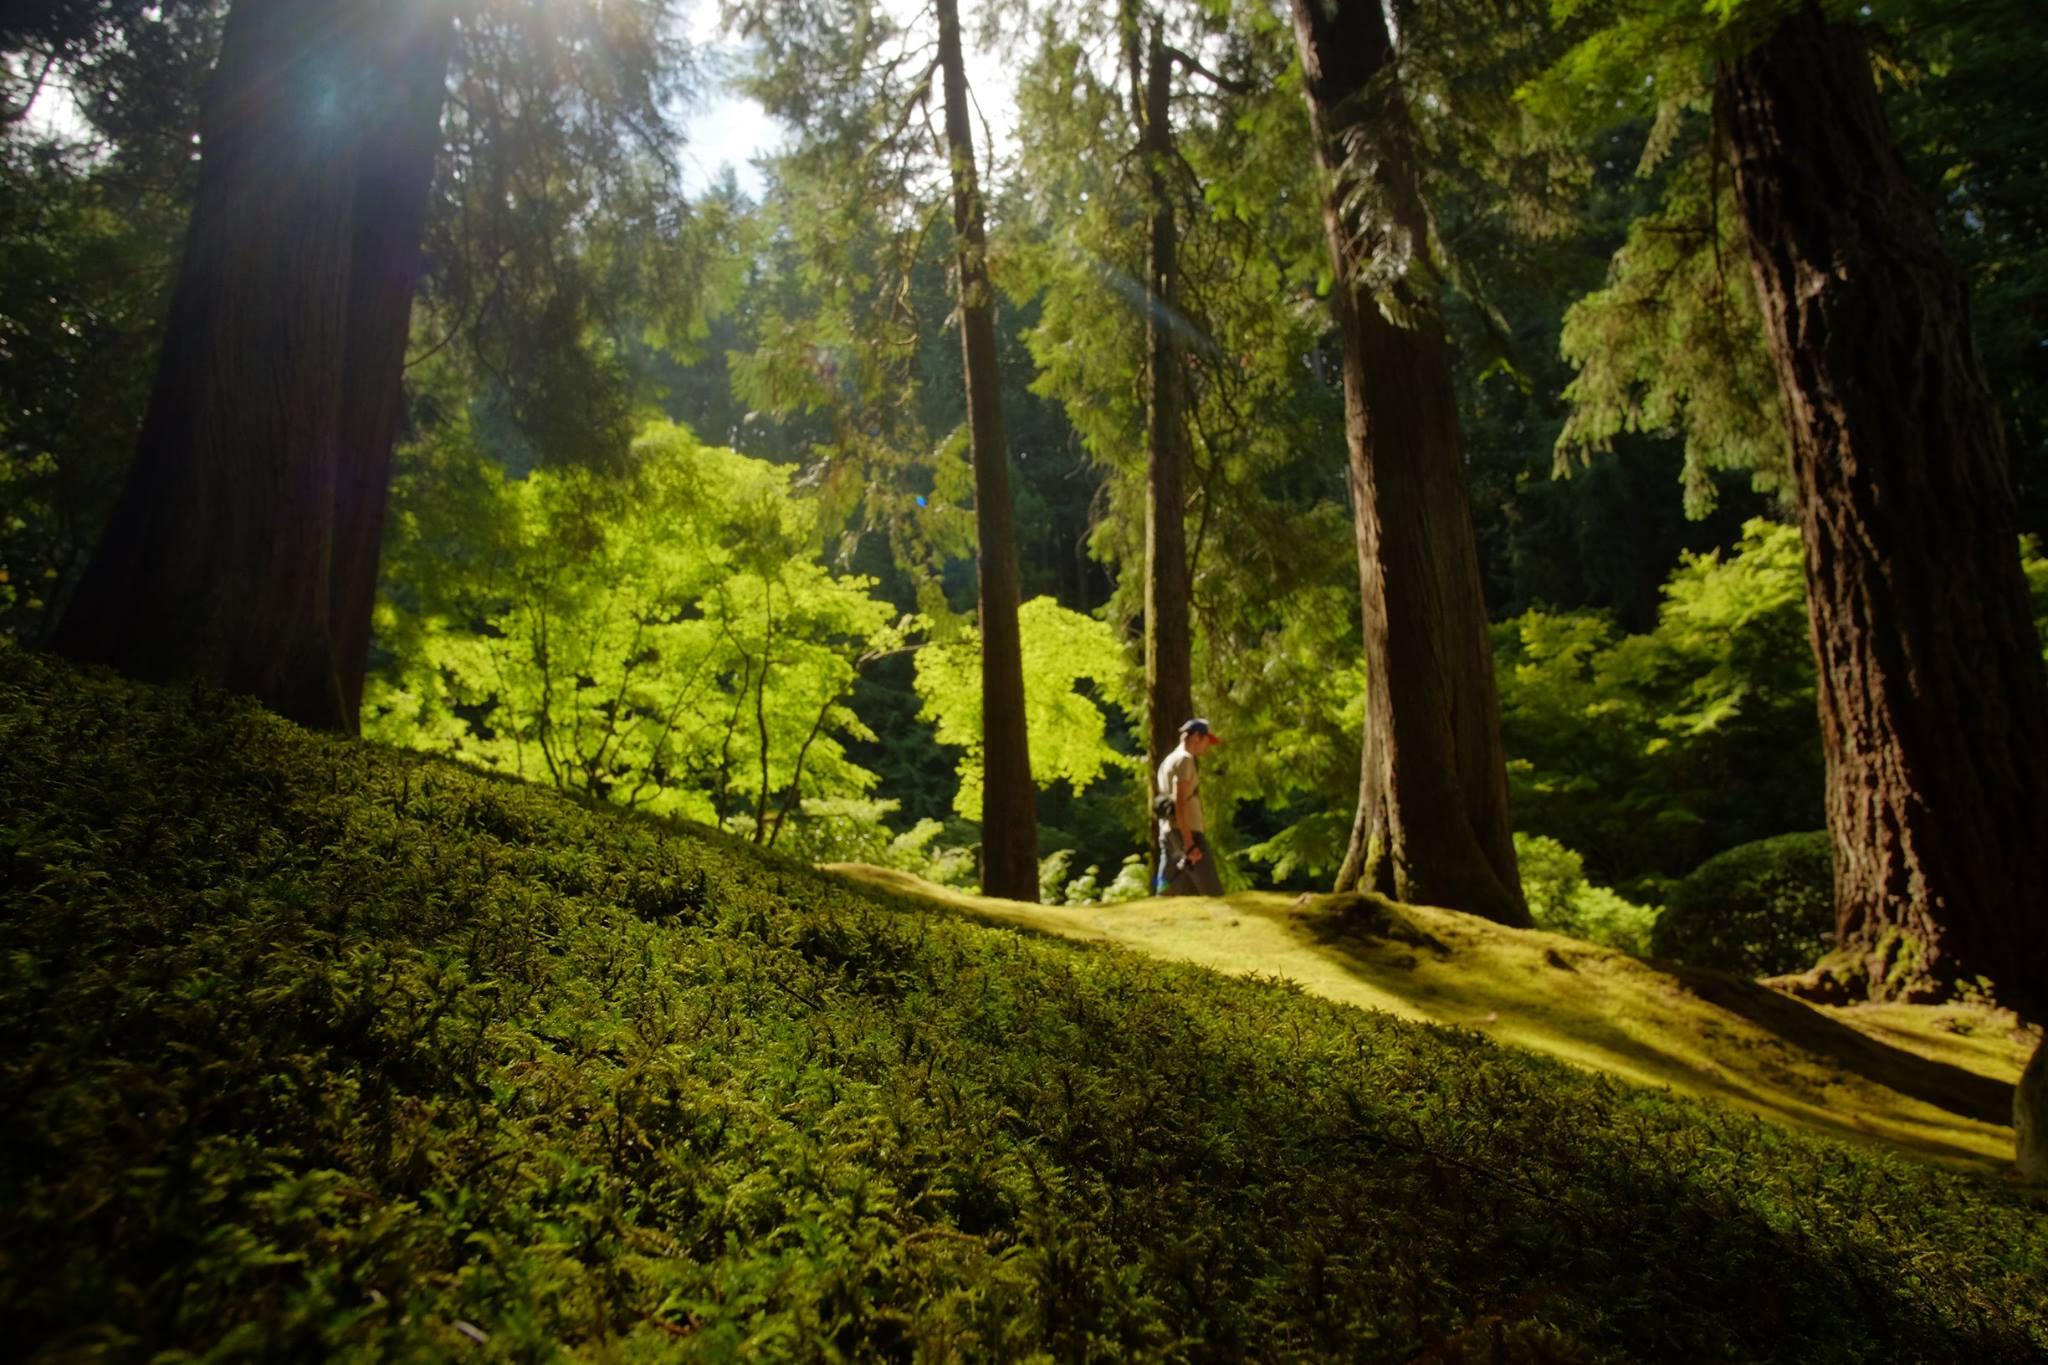 Japanese Garden moss, aka forest carpet